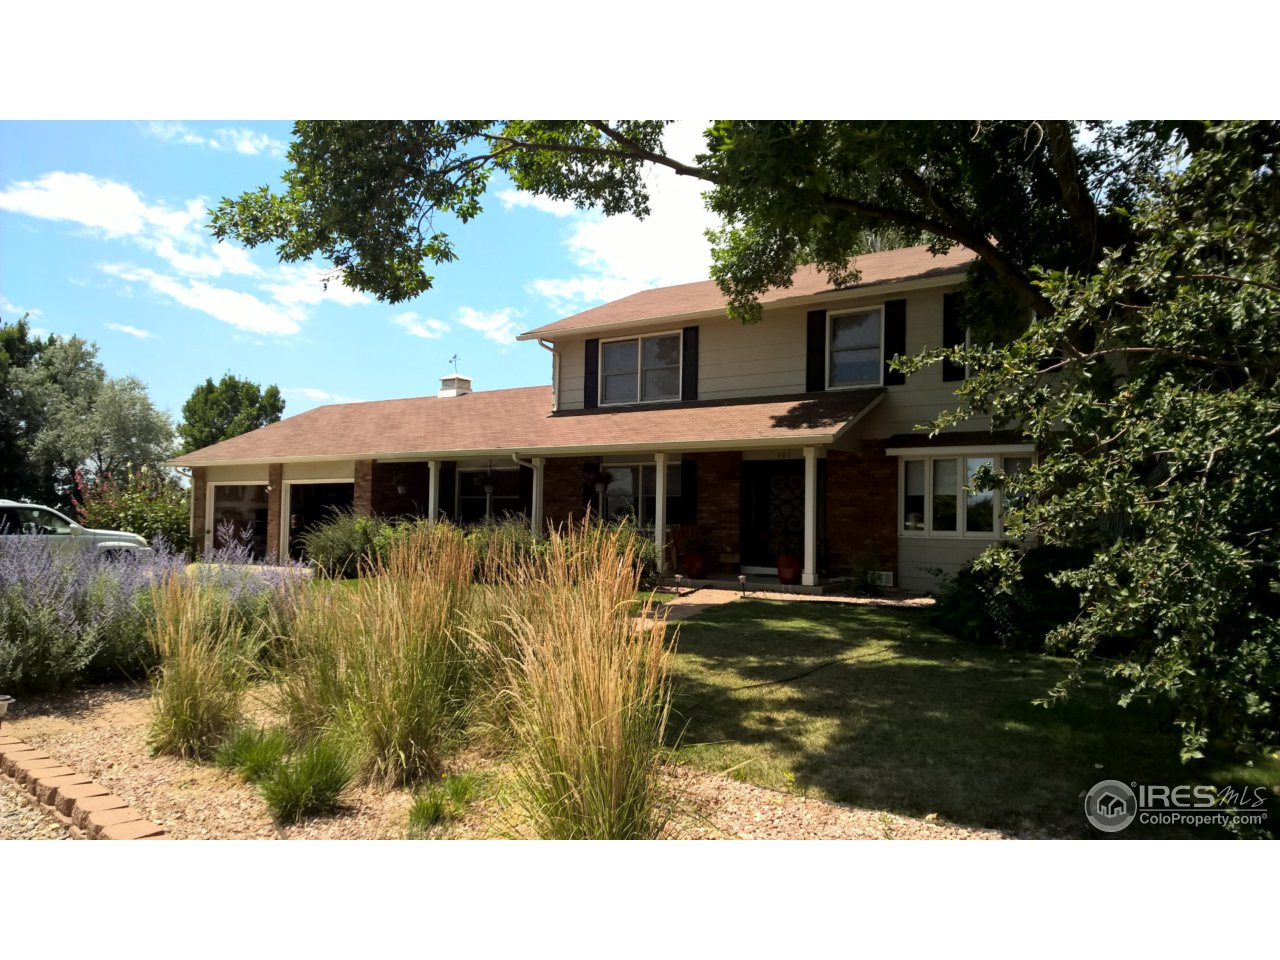 401 Ridgewood Ct, Fort Collins CO 80524